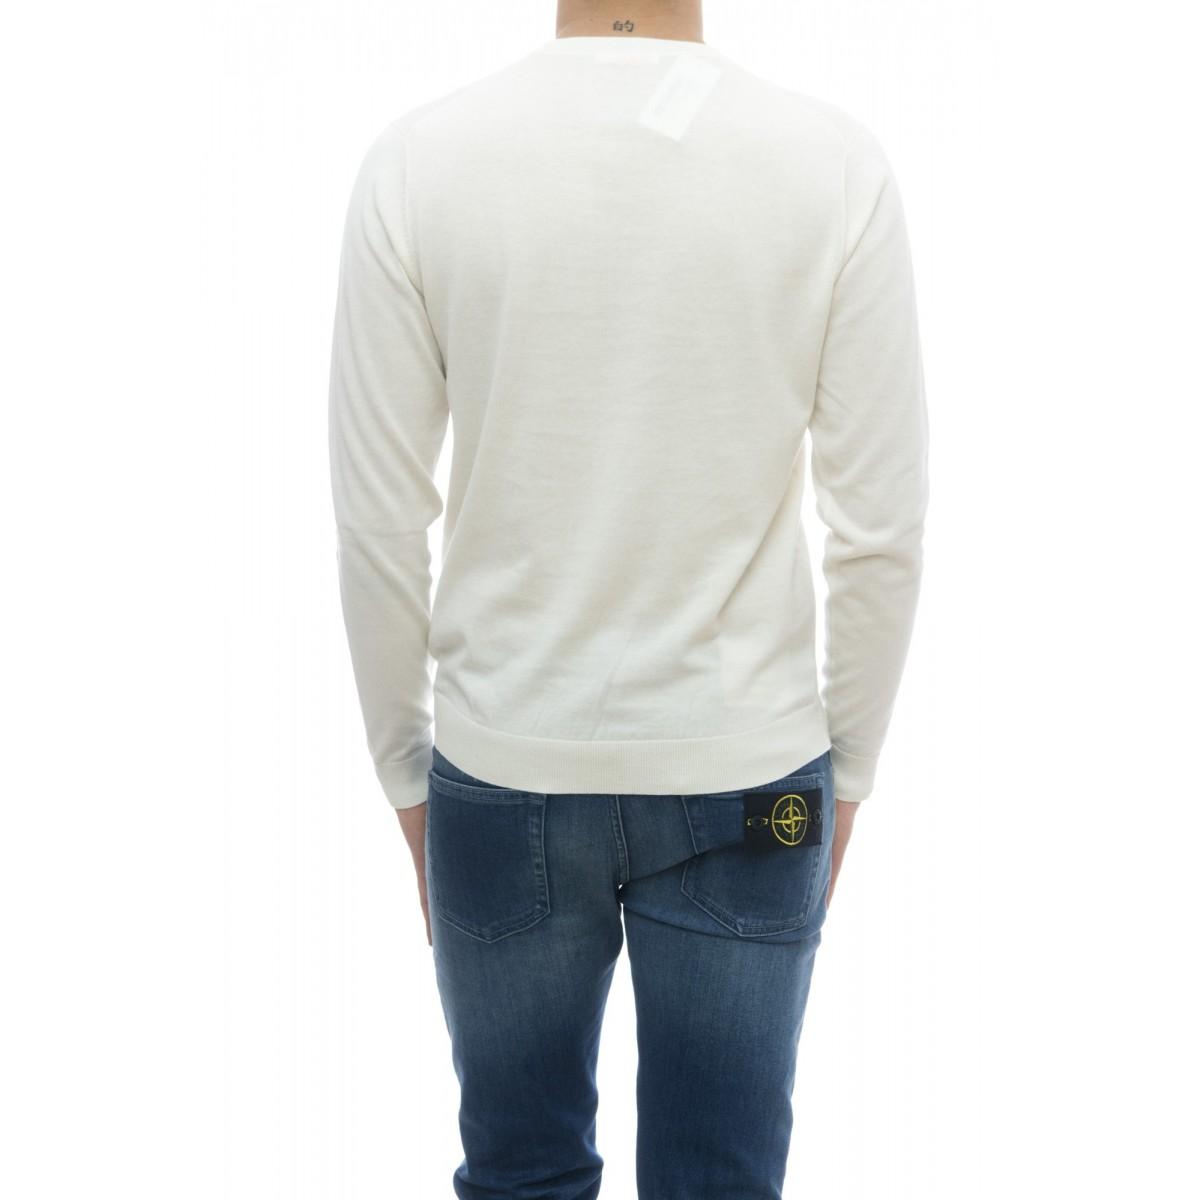 Maglia - K18101 maglia girocoloo